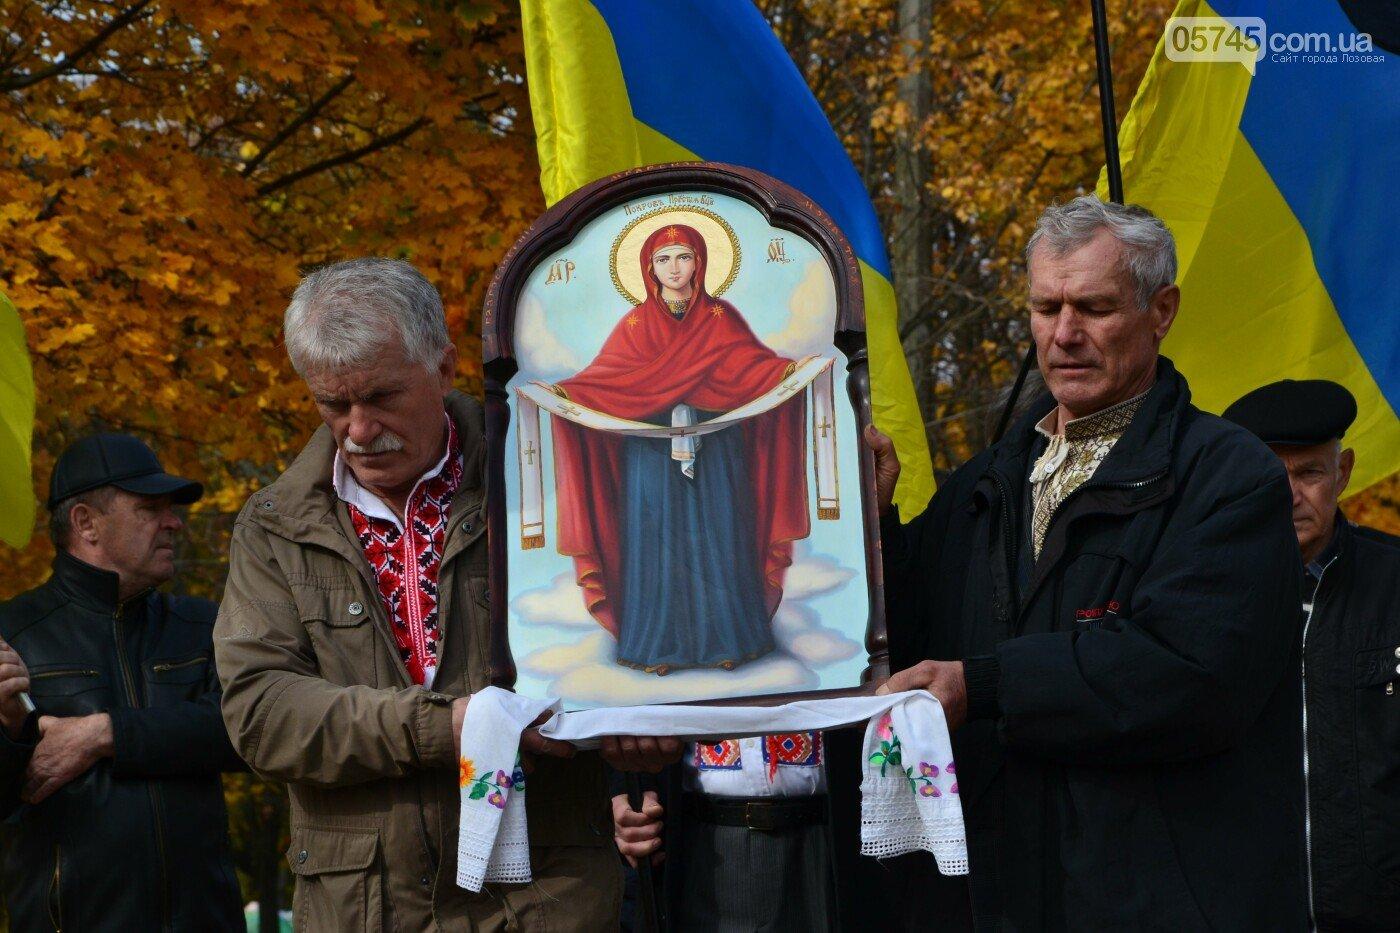 Без масок и карантина: как Лозовщина праздновала День защитника Украины год назад (ФОТО), фото-26